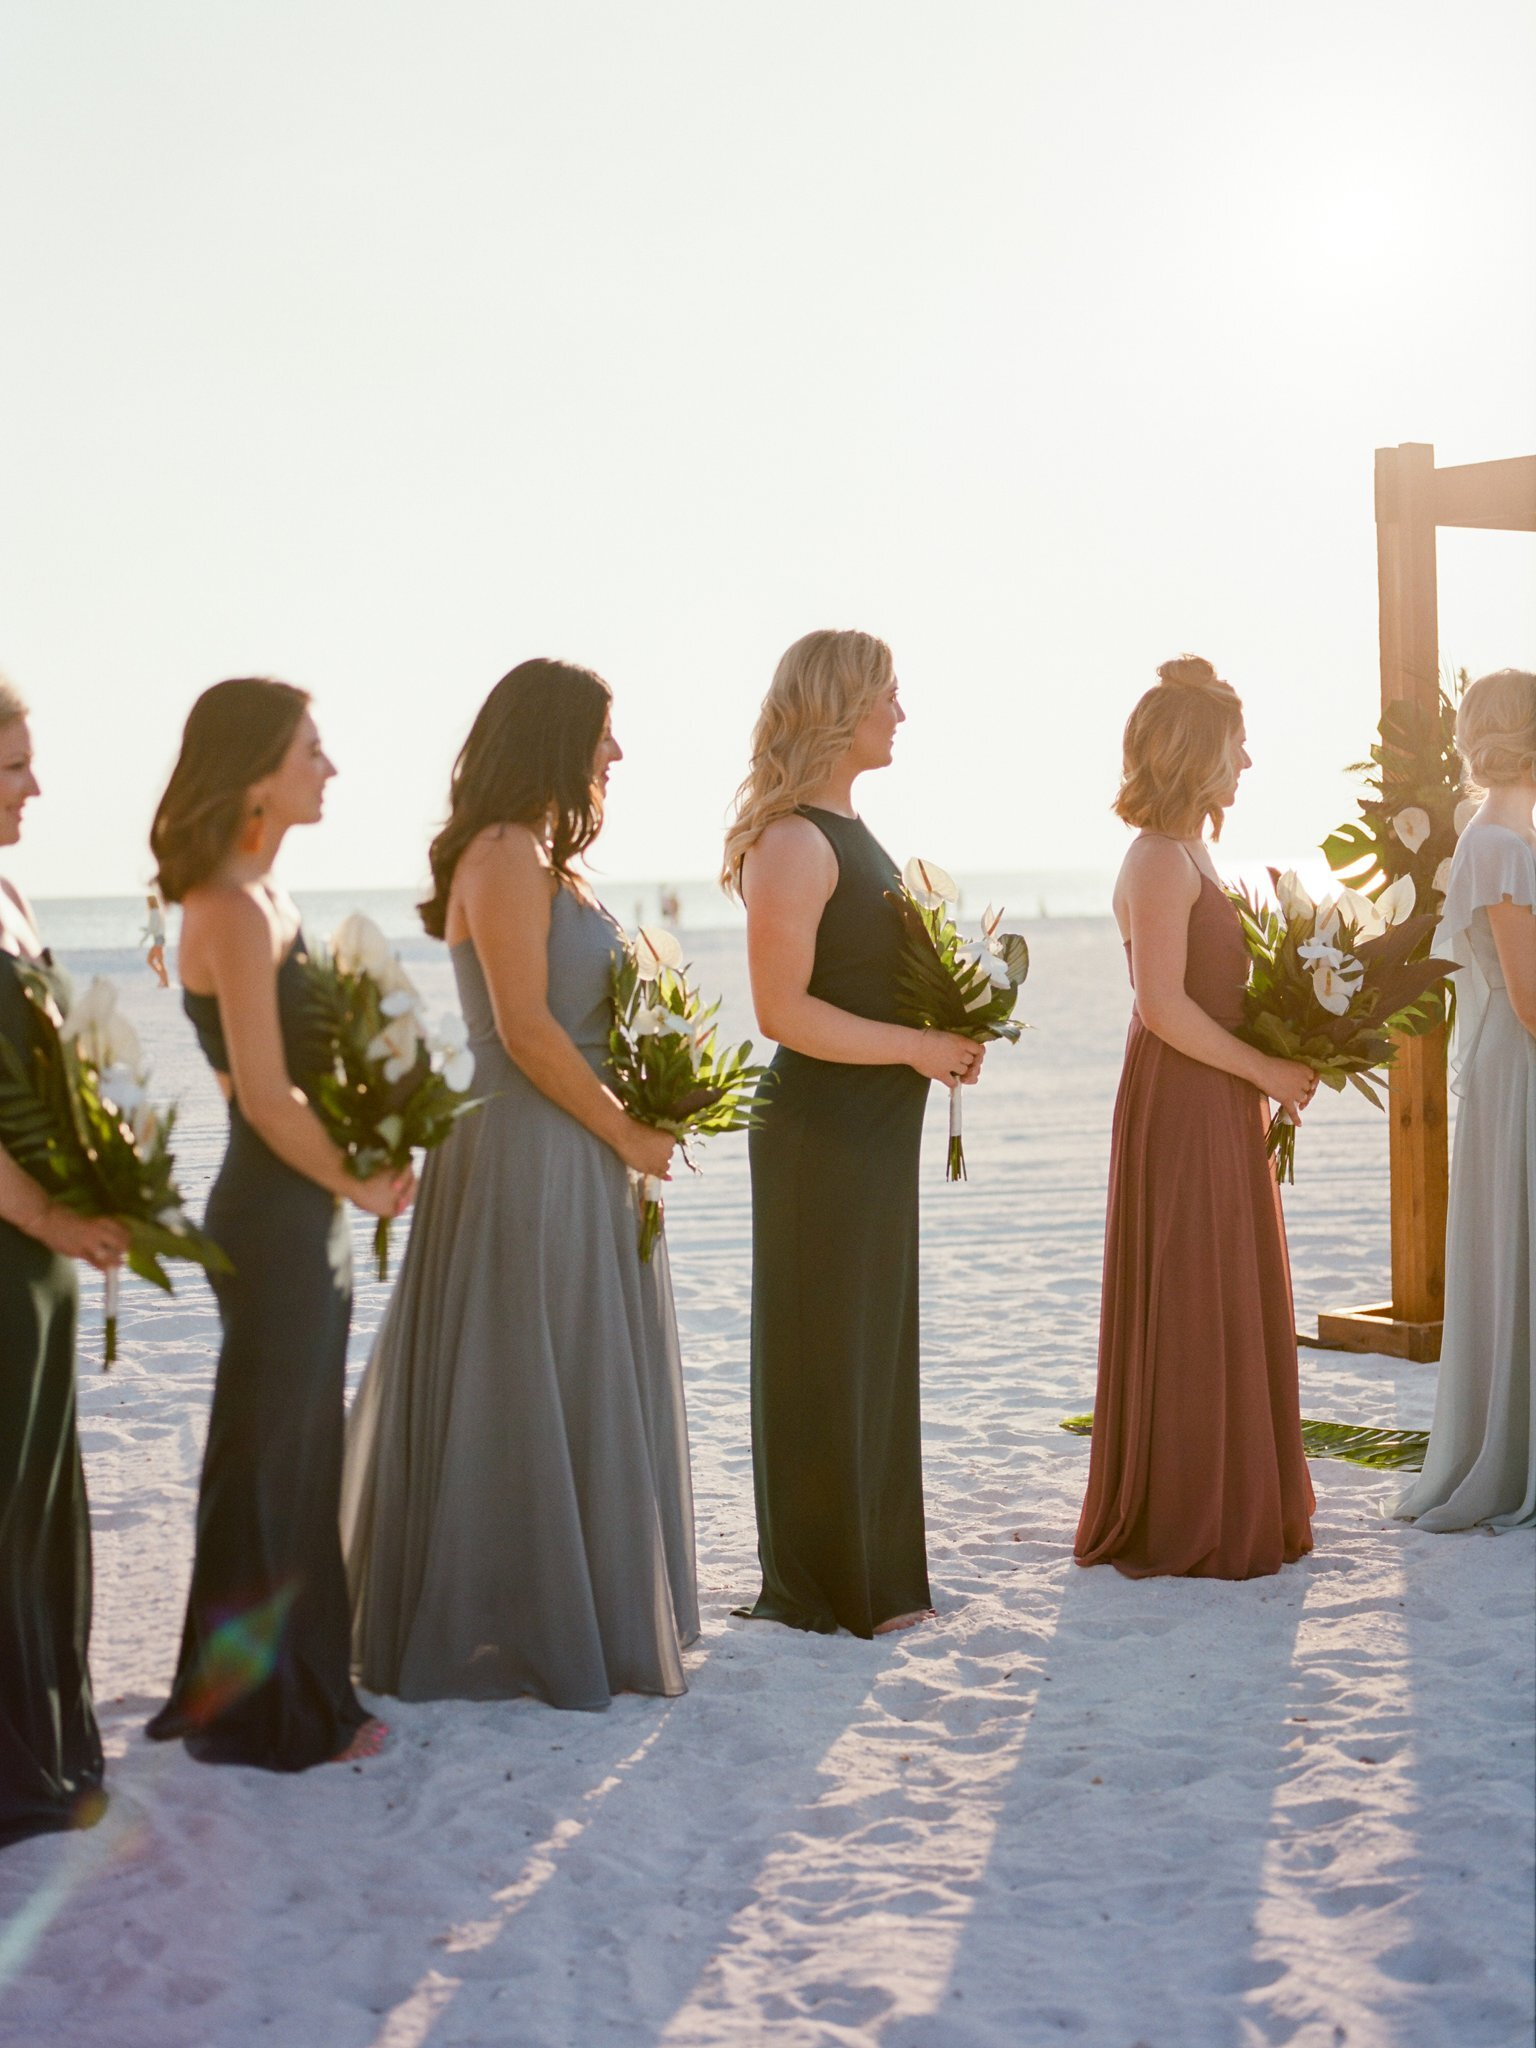 jw marriott marco island wedding photographer marco island wedding photographer shannon griffin photography_0180.jpg